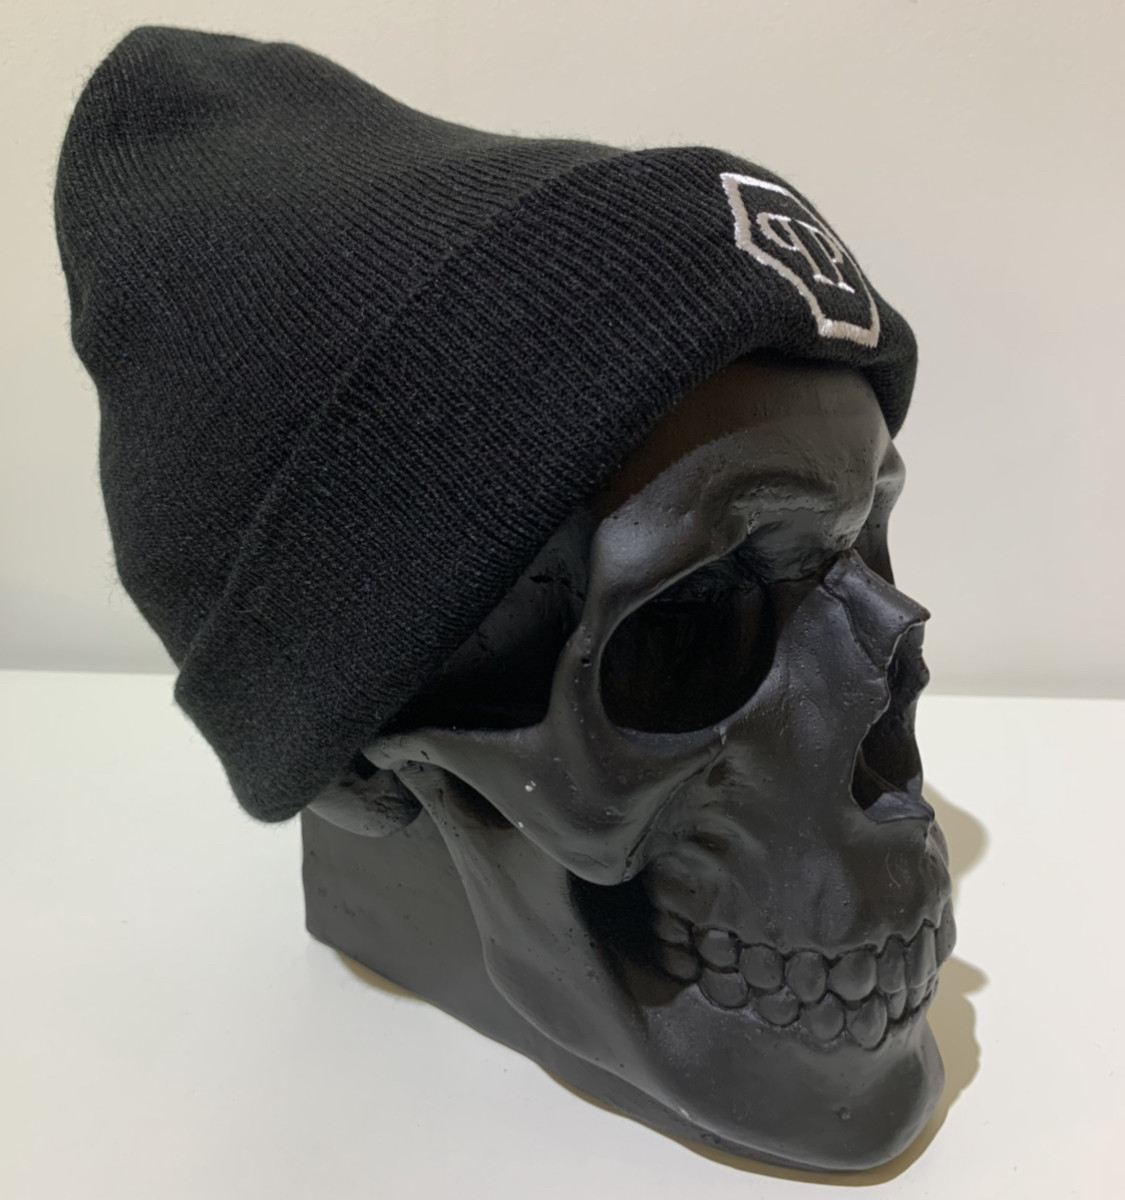 Шапка мужская черная Philipp Plein Logo - ❄️ Winter ❄️ Черная